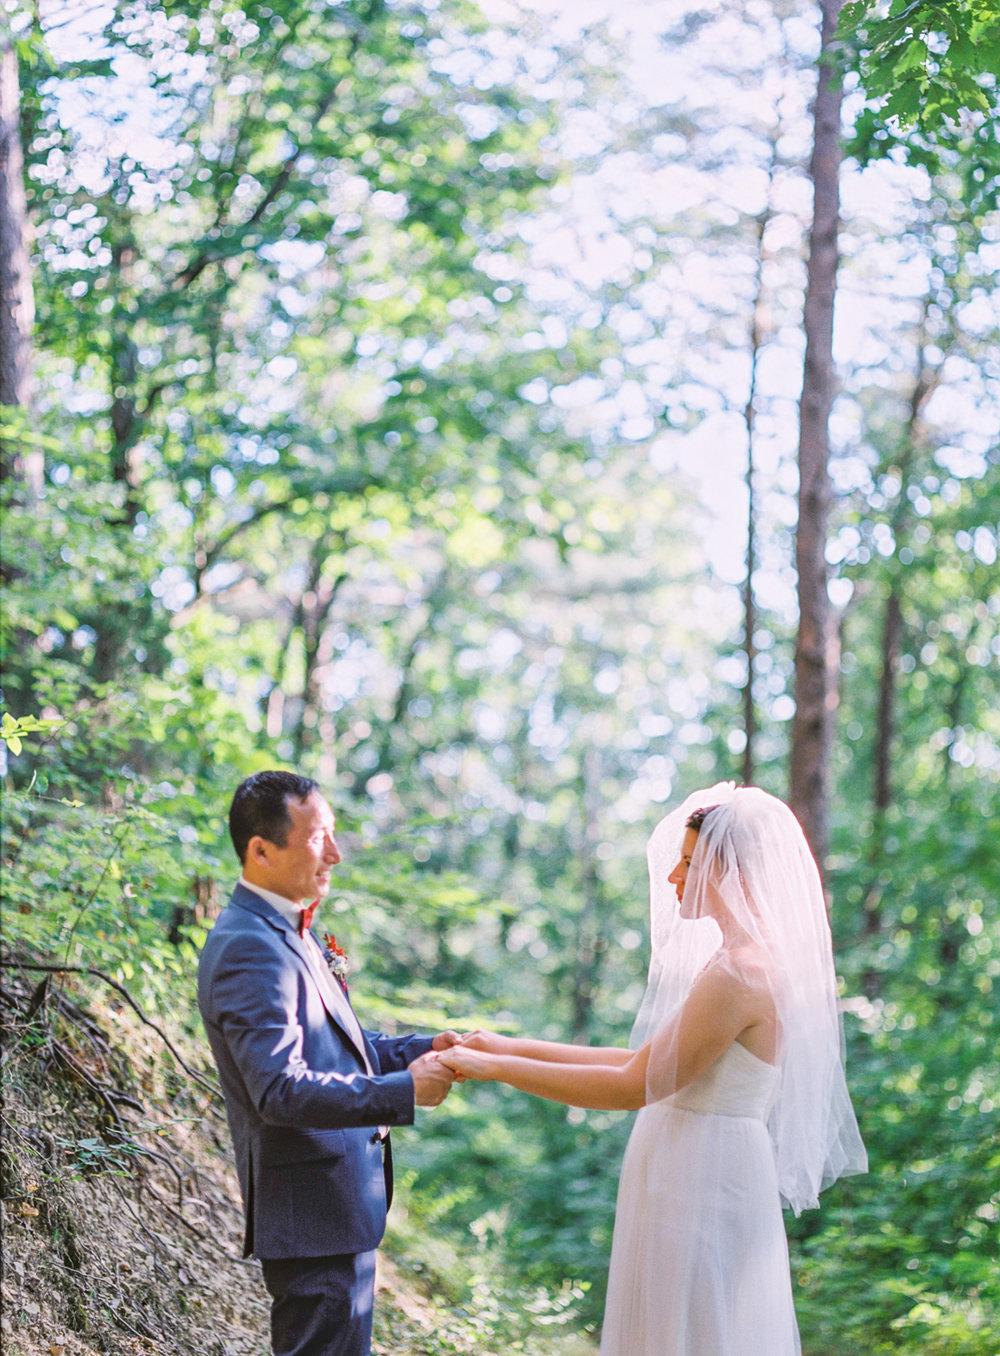 Leaf-&-Pine-Lindsey-Kaiphen-Wedding-38.jpg